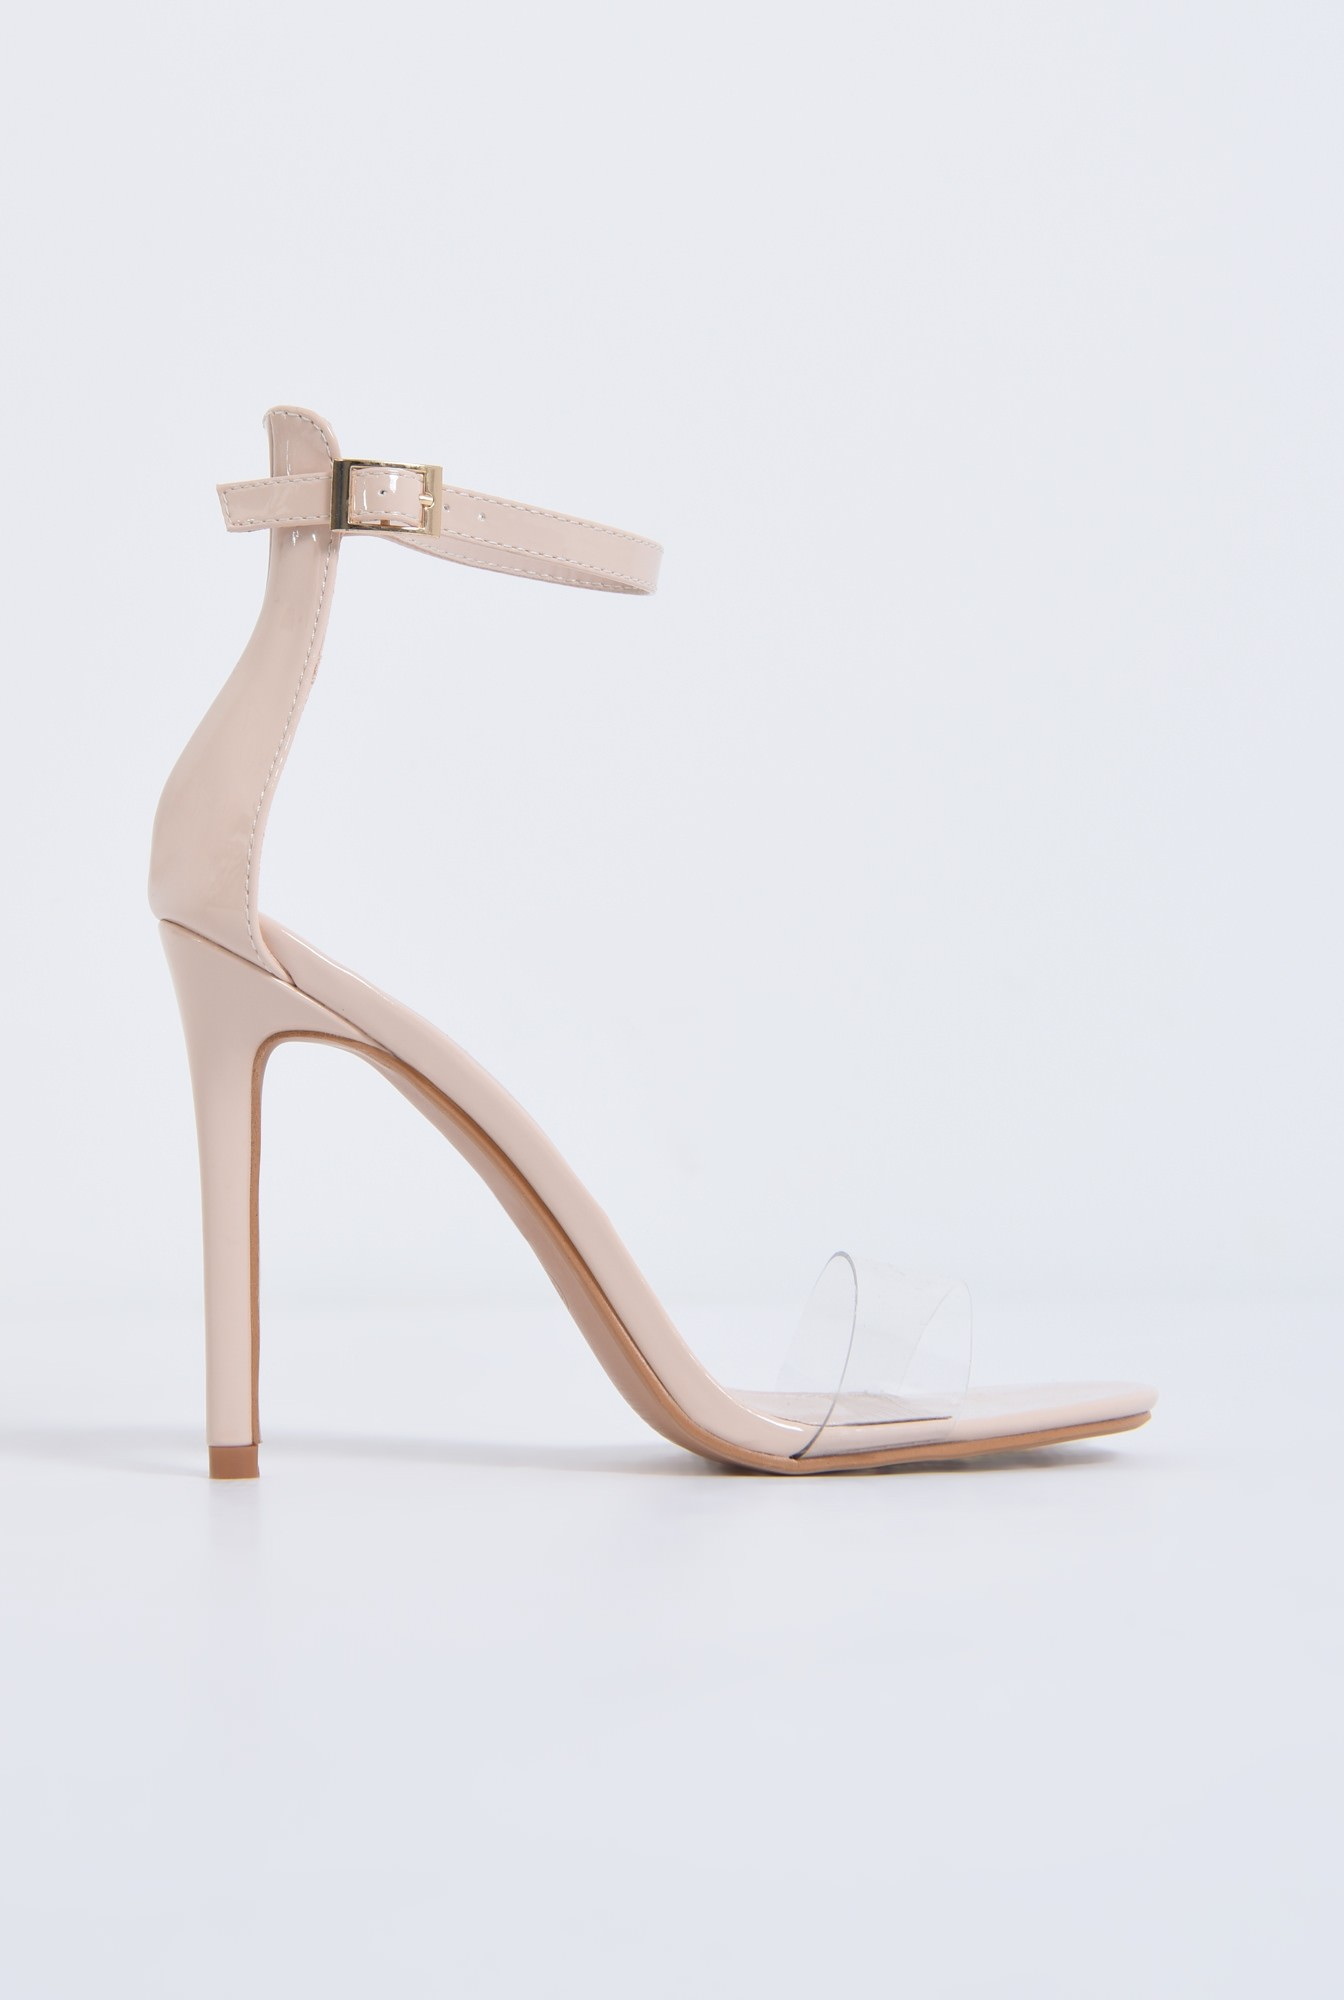 0 - sandale elegante, nude, lac, stiletto